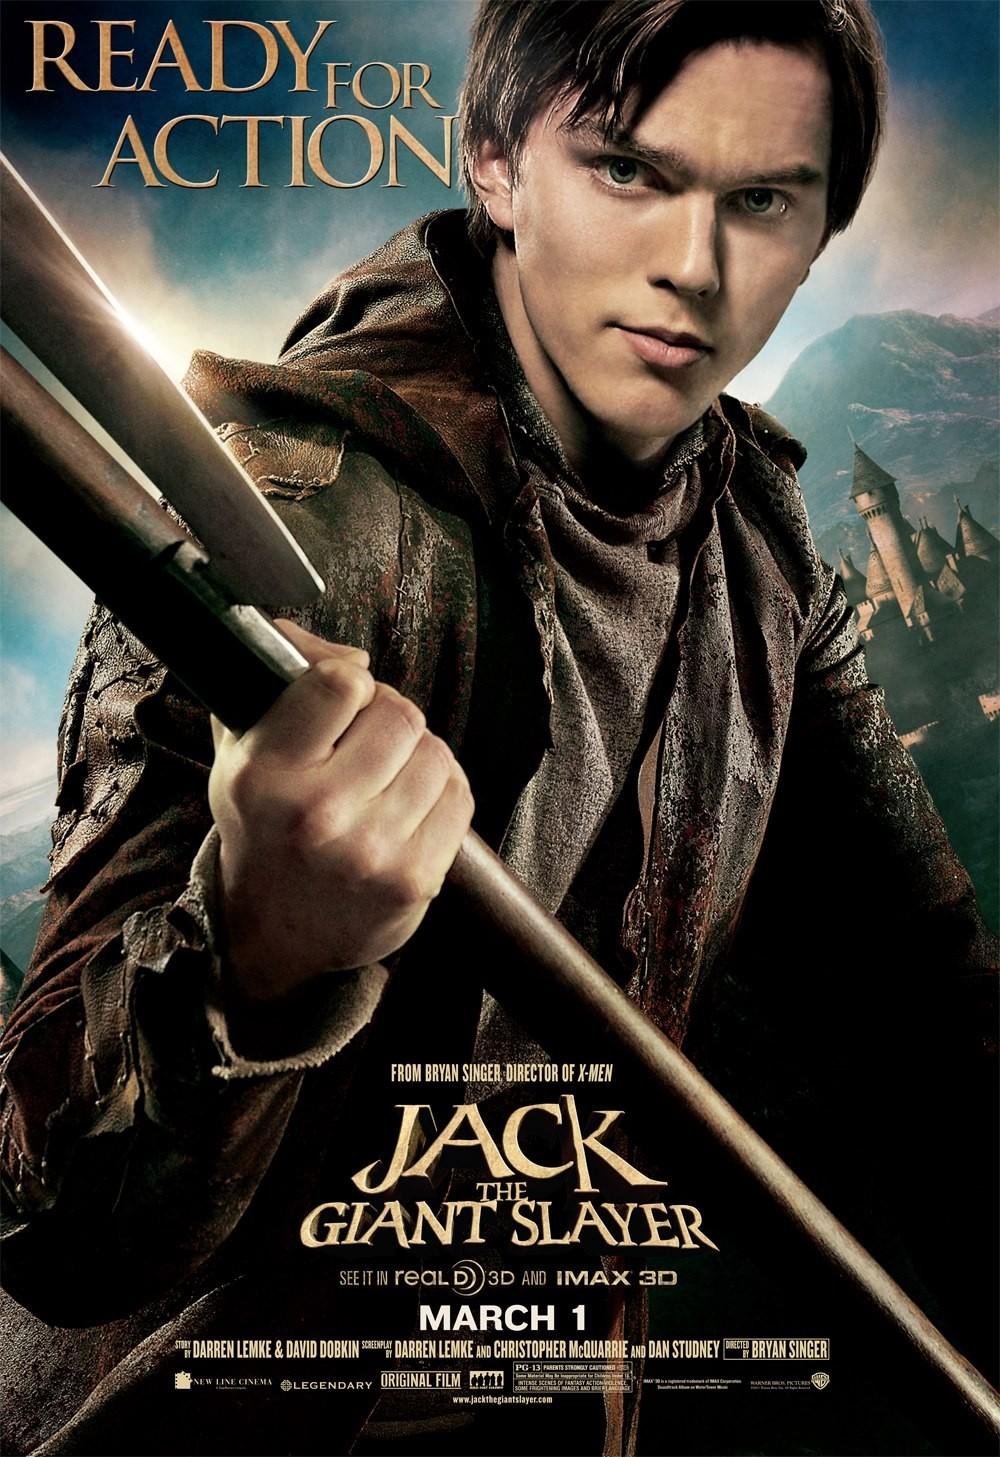 http://media.kino-govno.com/movies/j/jackthegiantkiller/posters/jackthegiantkiller_20.jpg